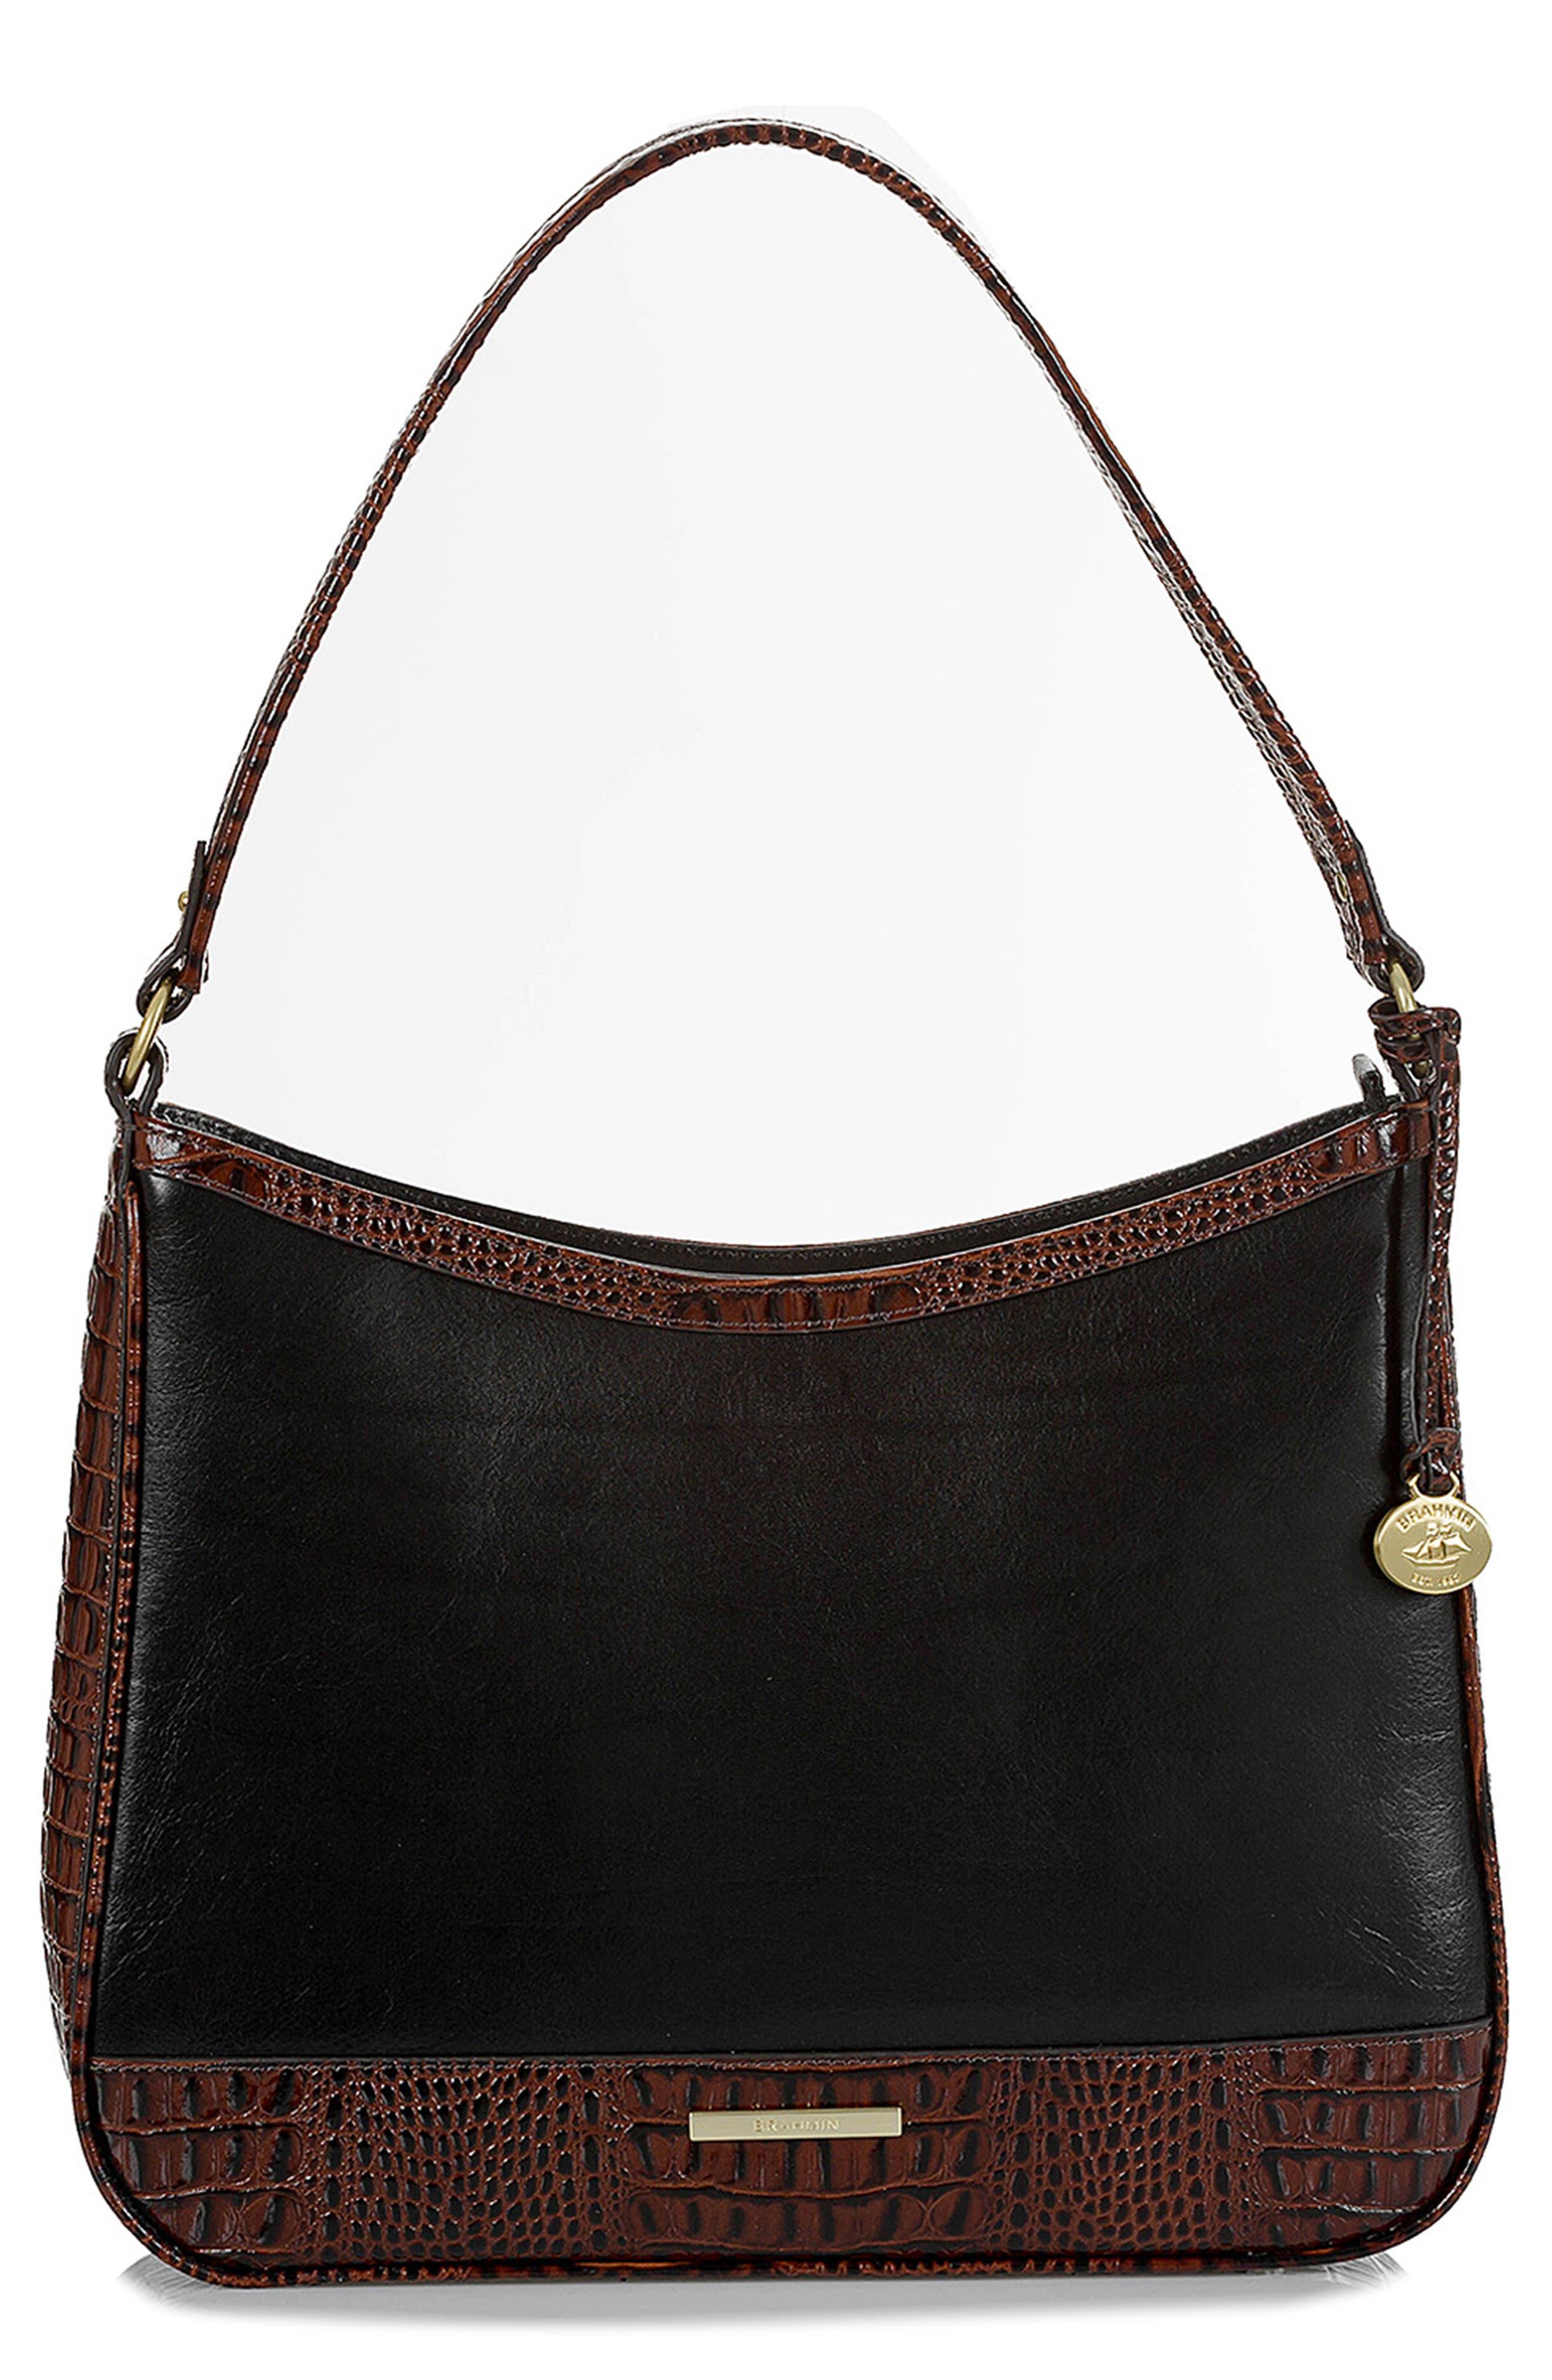 BRAHMIN, Noelle Leather Hobo Bag, Main thumbnail 1, color, 001